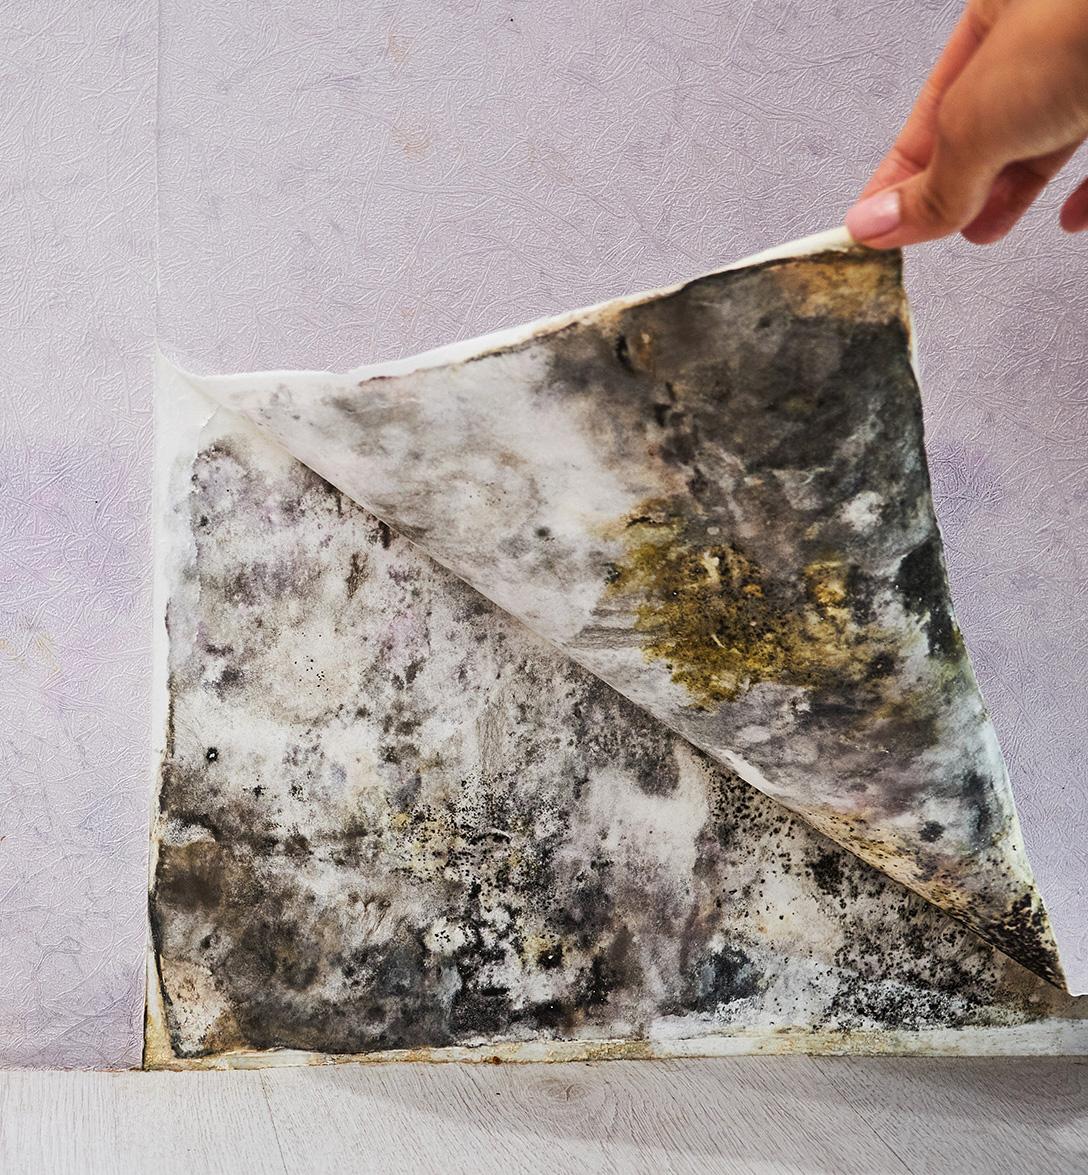 mold remediation standards